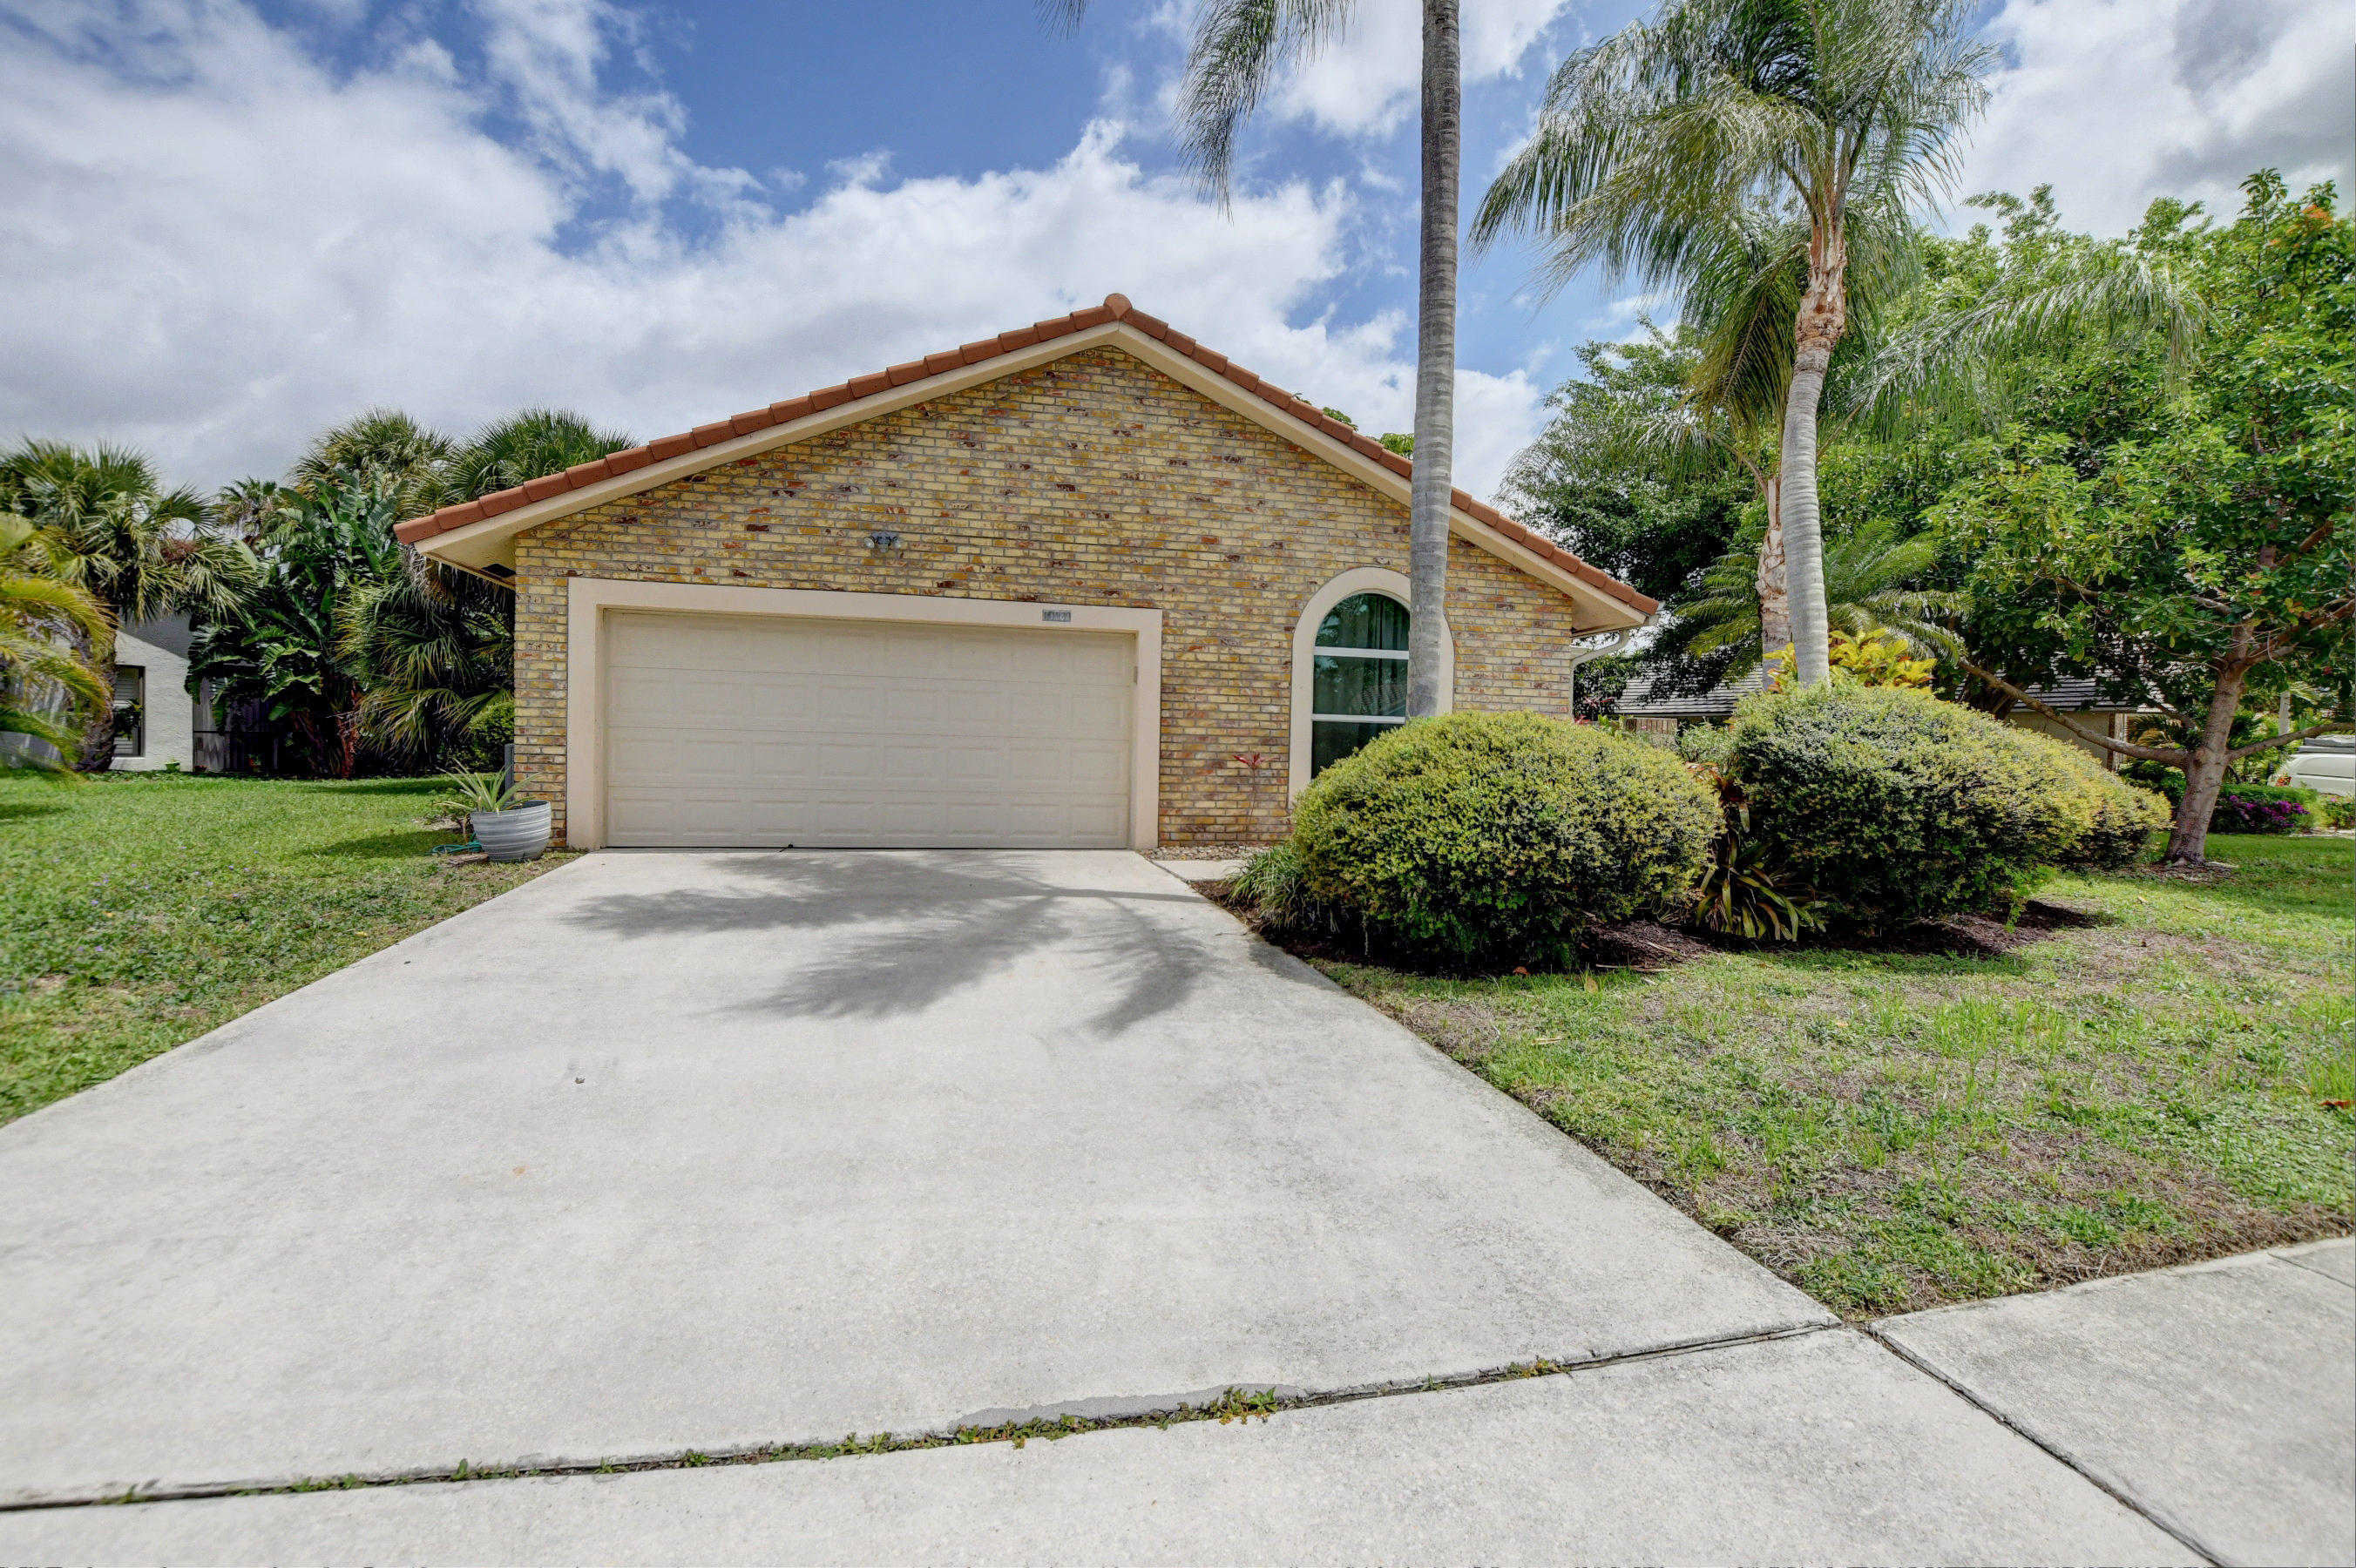 1018 Camelback Lane Boca Raton, FL 33498